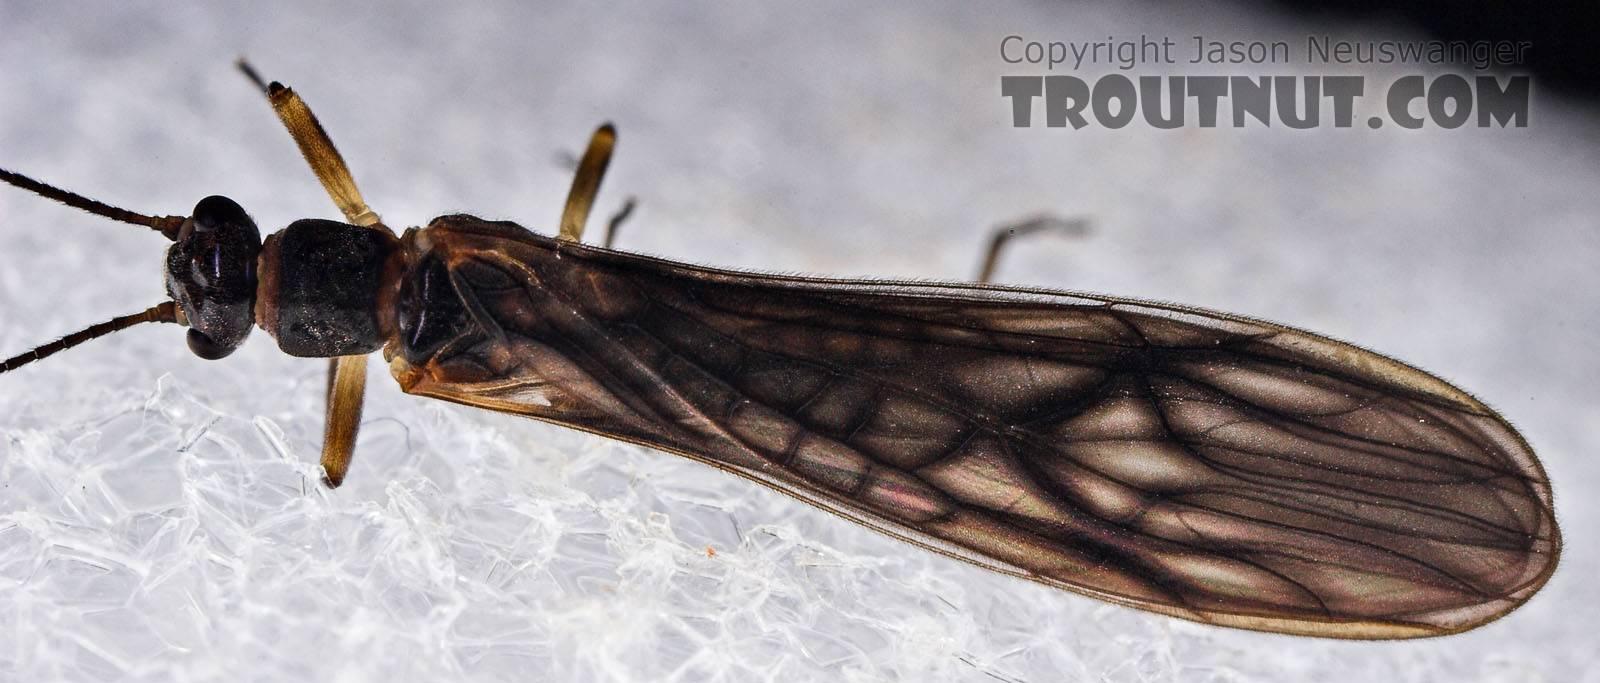 Female Amphinemura (Tiny Winter Blacks) Stonefly Adult from Mystery Creek #23 in New York